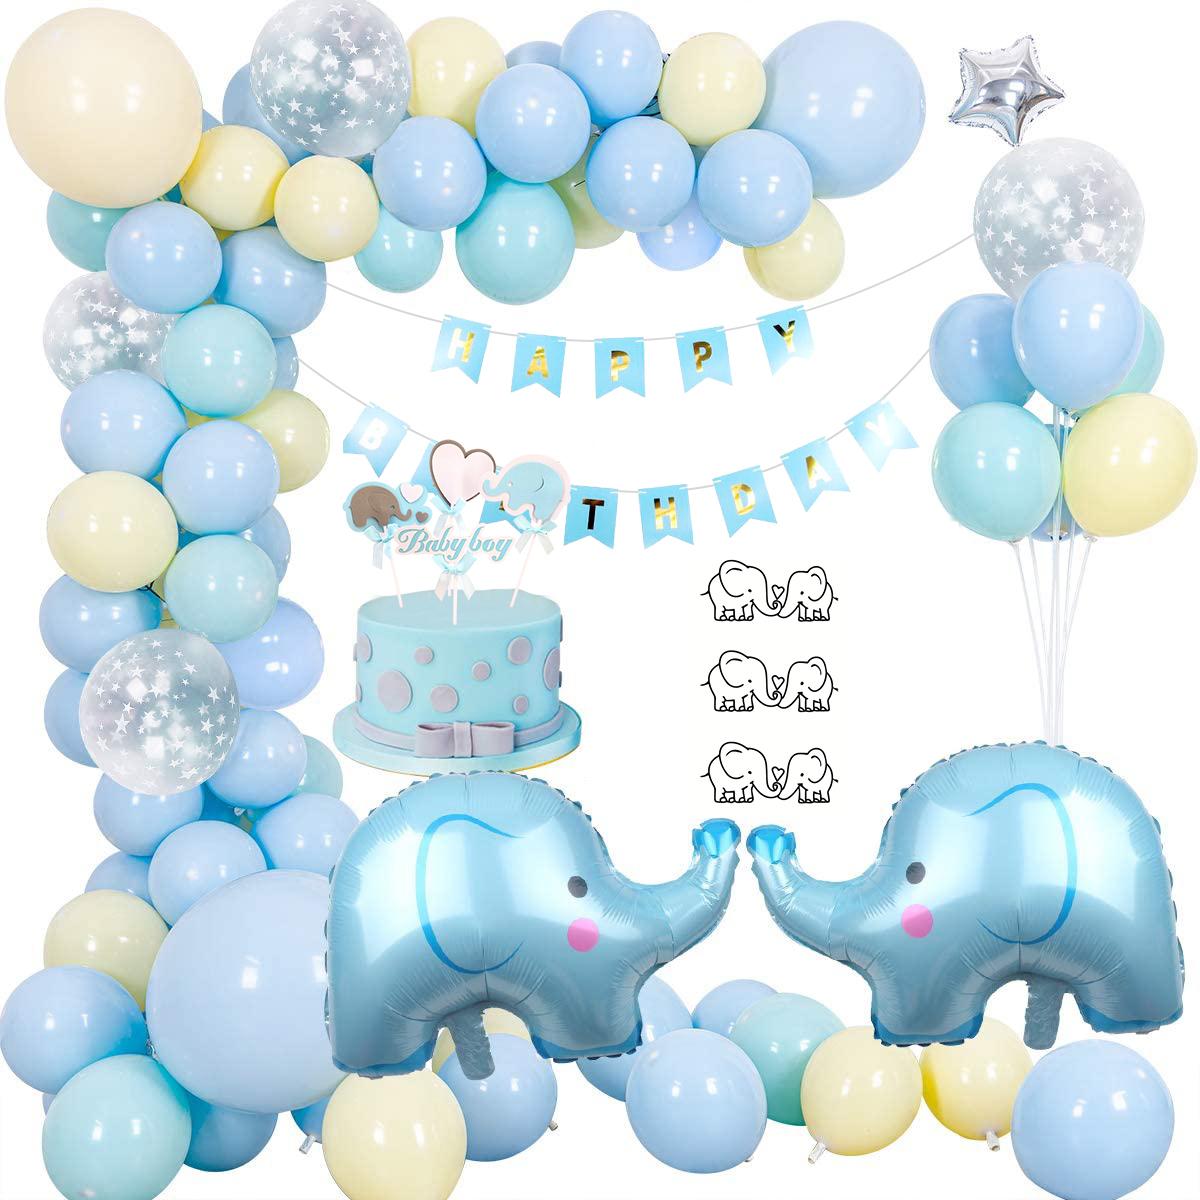 Blue Elephant Birthday Party Decorations Birthday Party Balloon ...